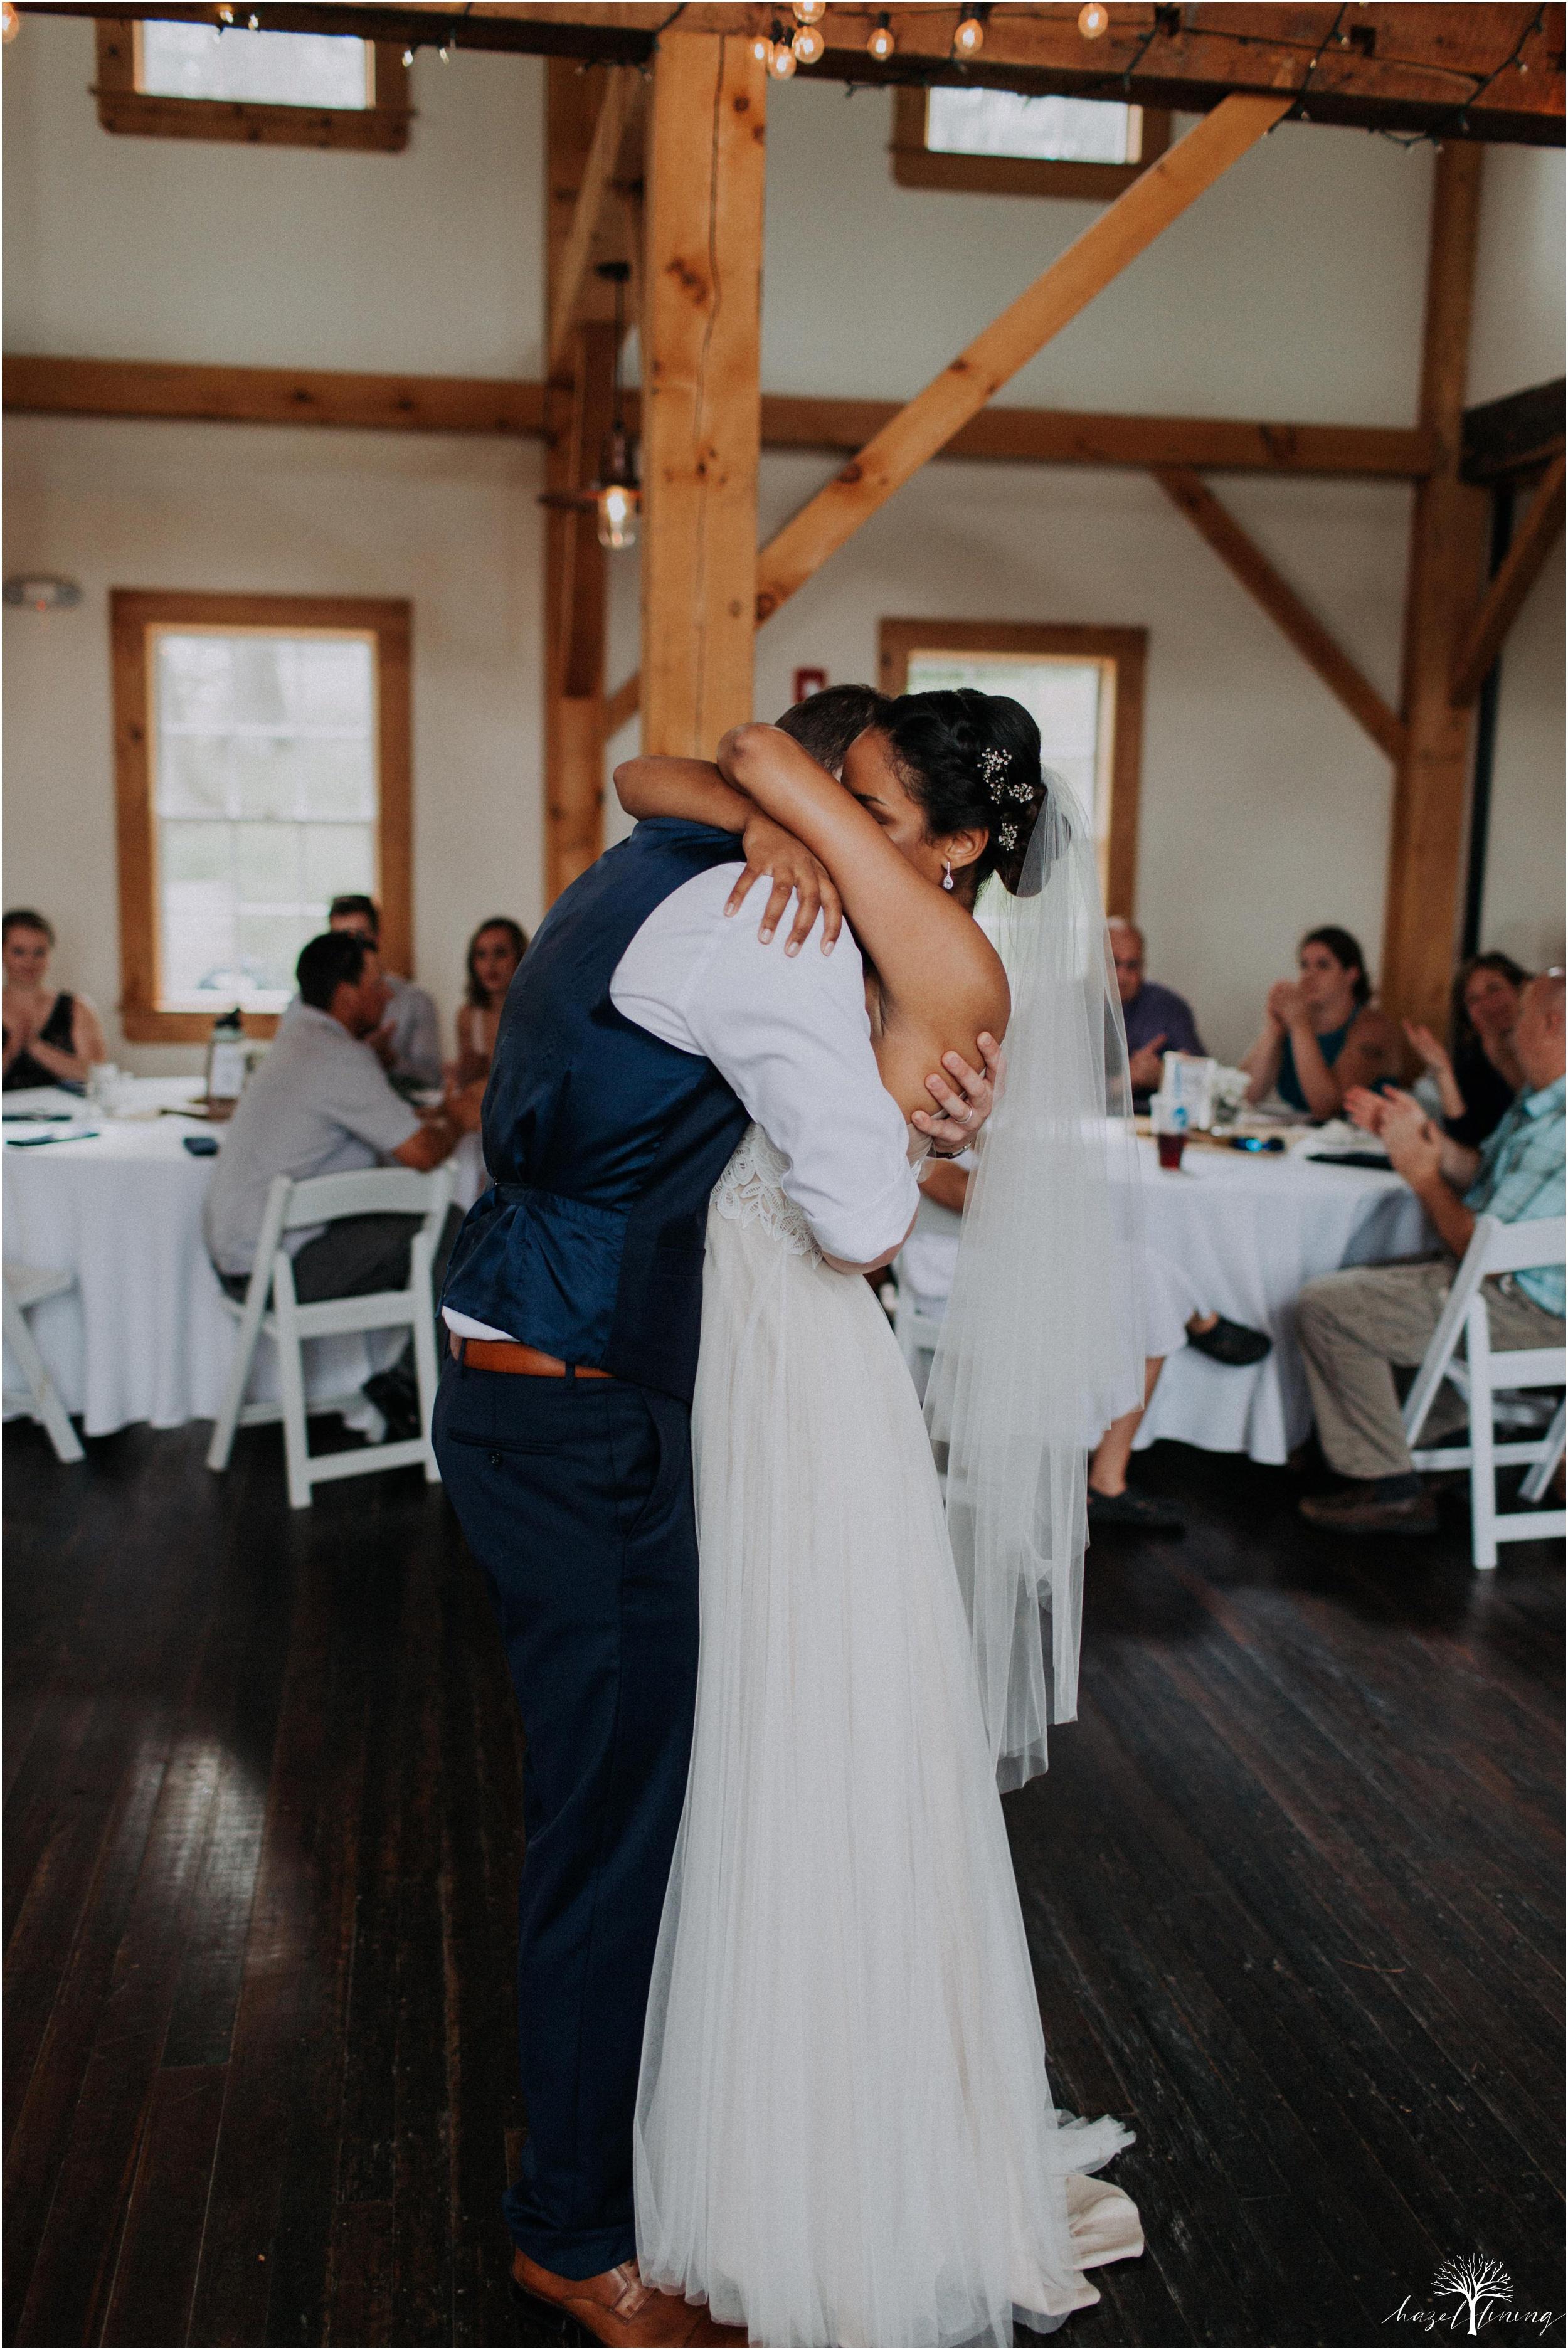 mariah-kreyling-samuel-sherratt-sherrattwiththeworld-peirce-farm-at-witch-hill-boston-massachusetts-wedding-photography-hazel-lining-travel-wedding-elopement-photography_0164.jpg